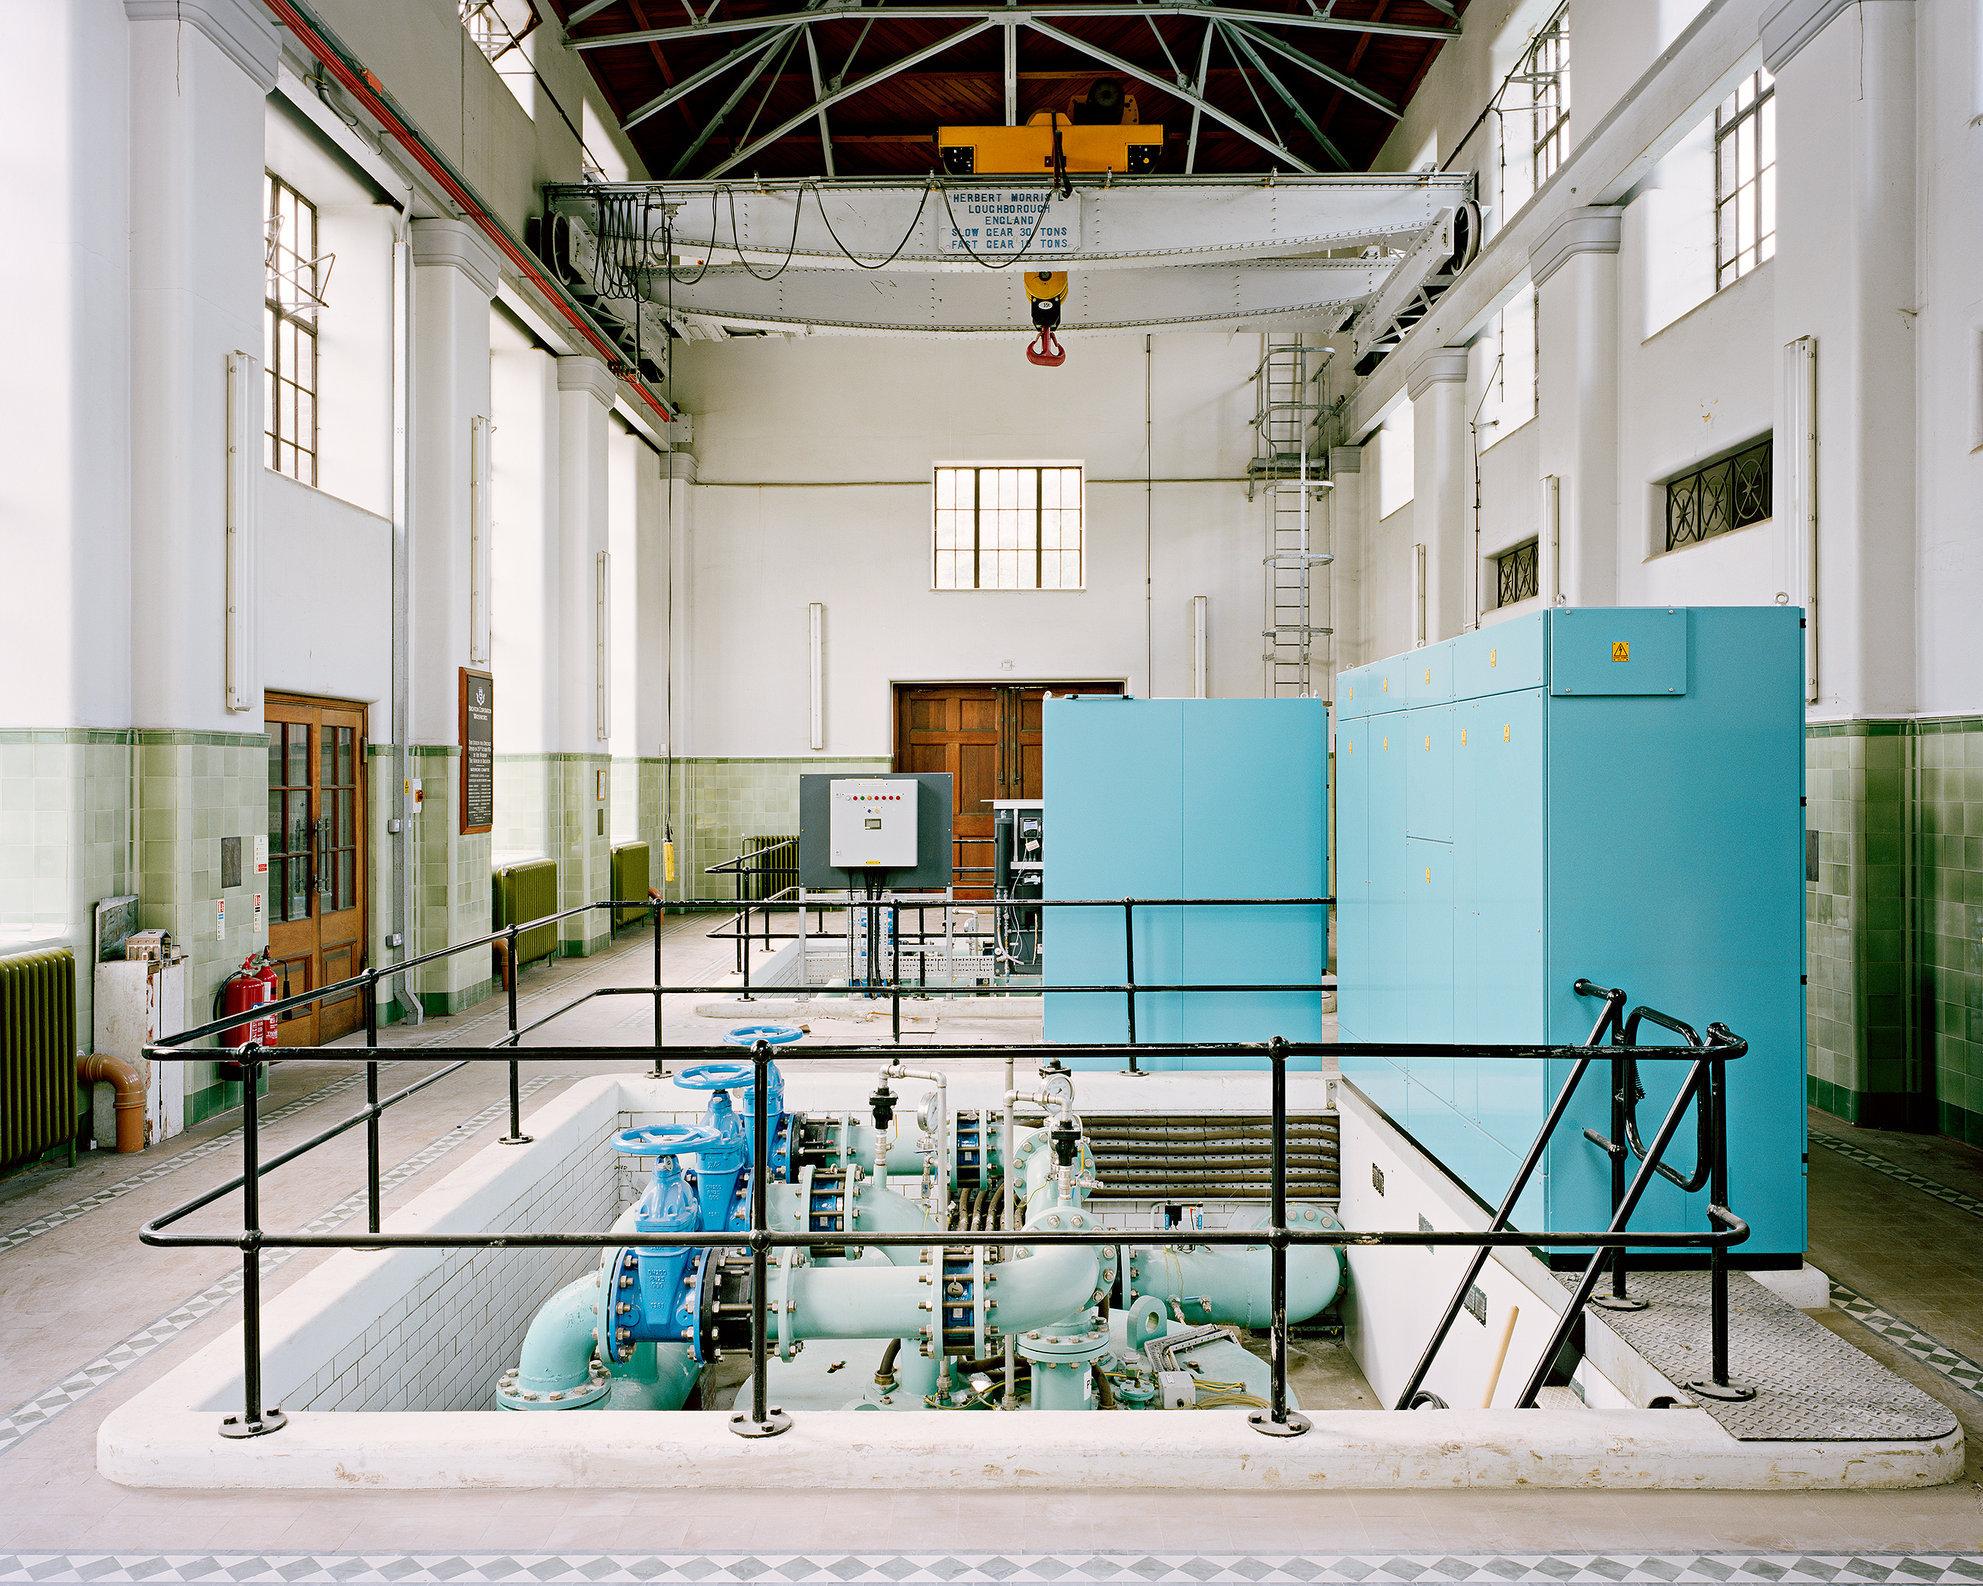 Water Supply Works, East Brighton